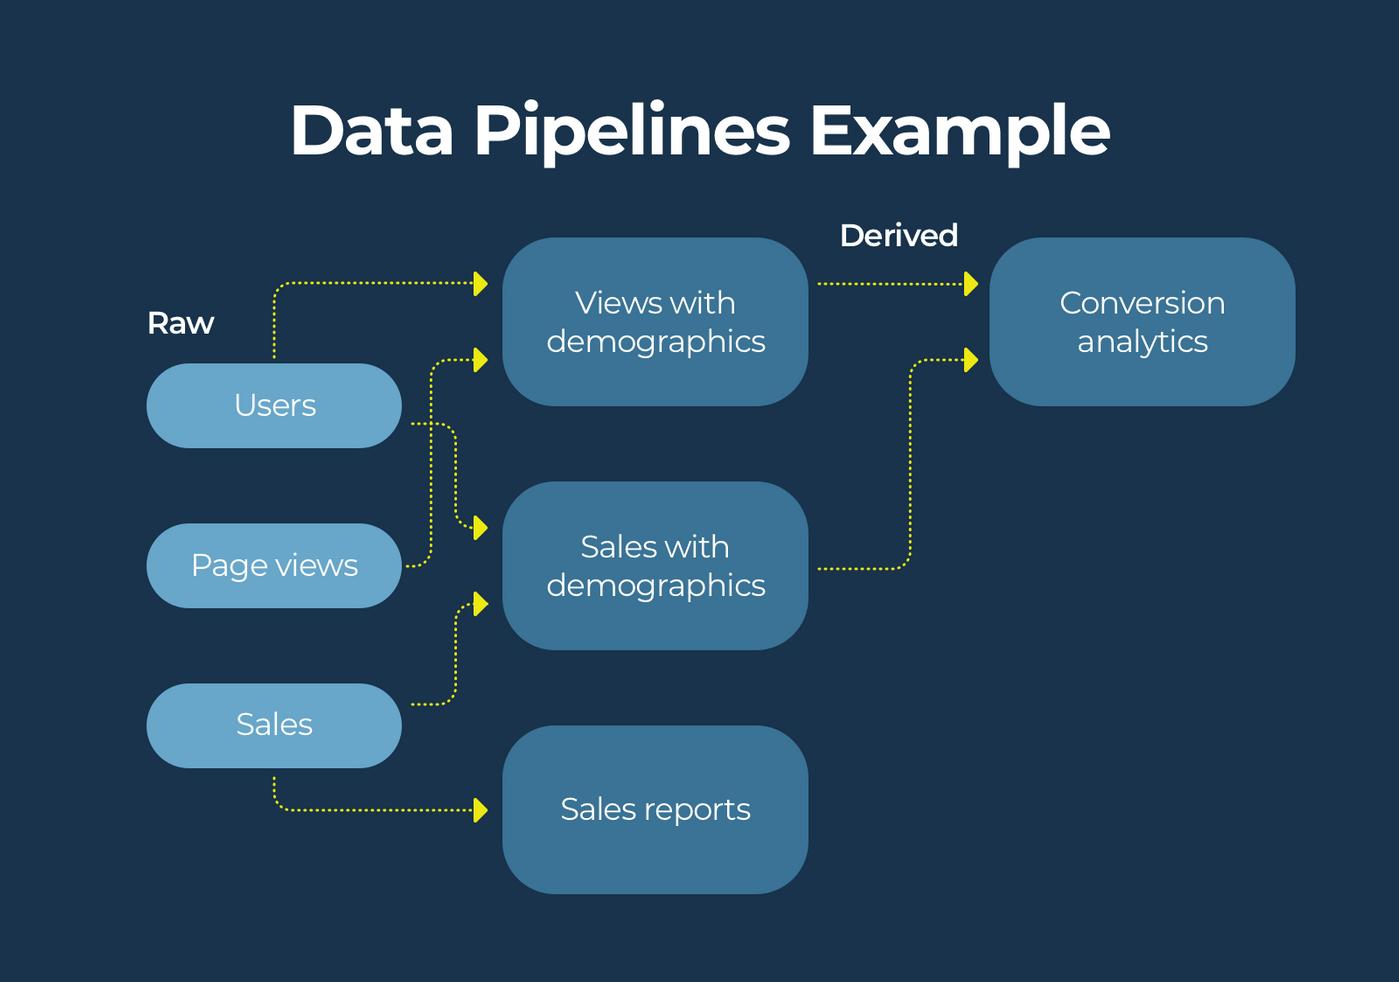 Data pipelines example